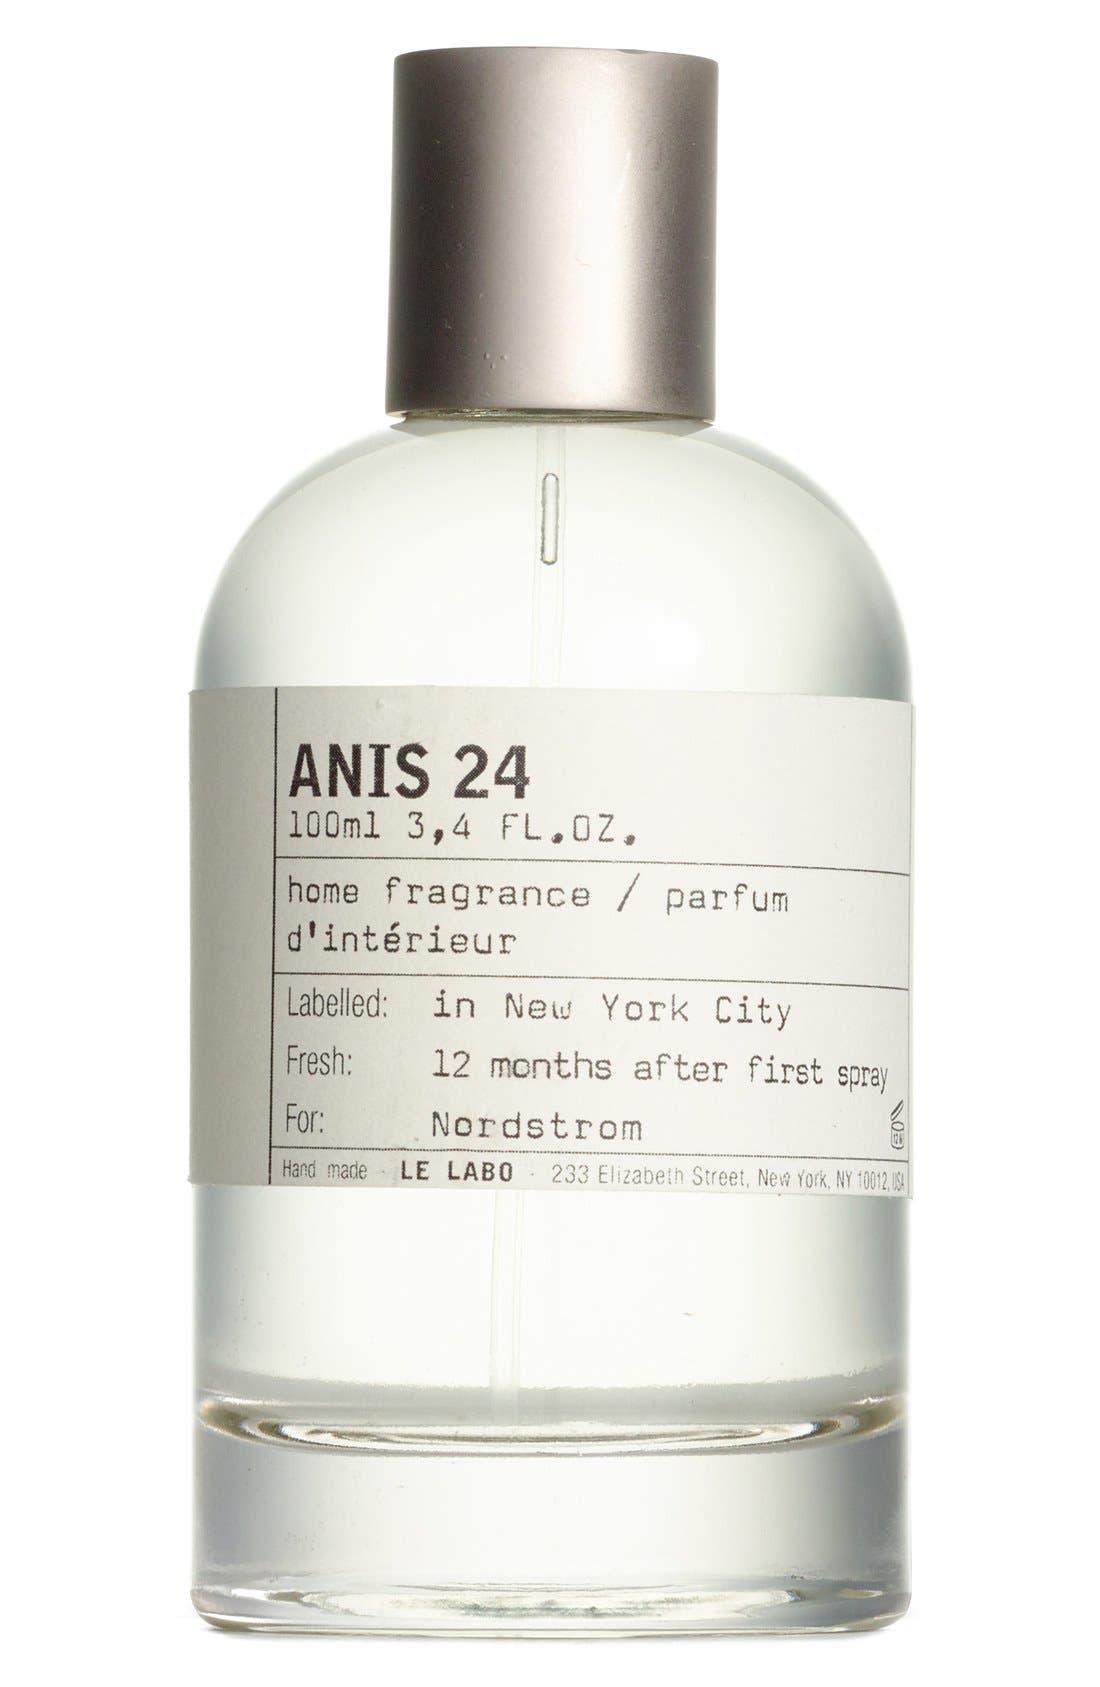 LE LABO 'Anis 24' Home Fragrance Spray